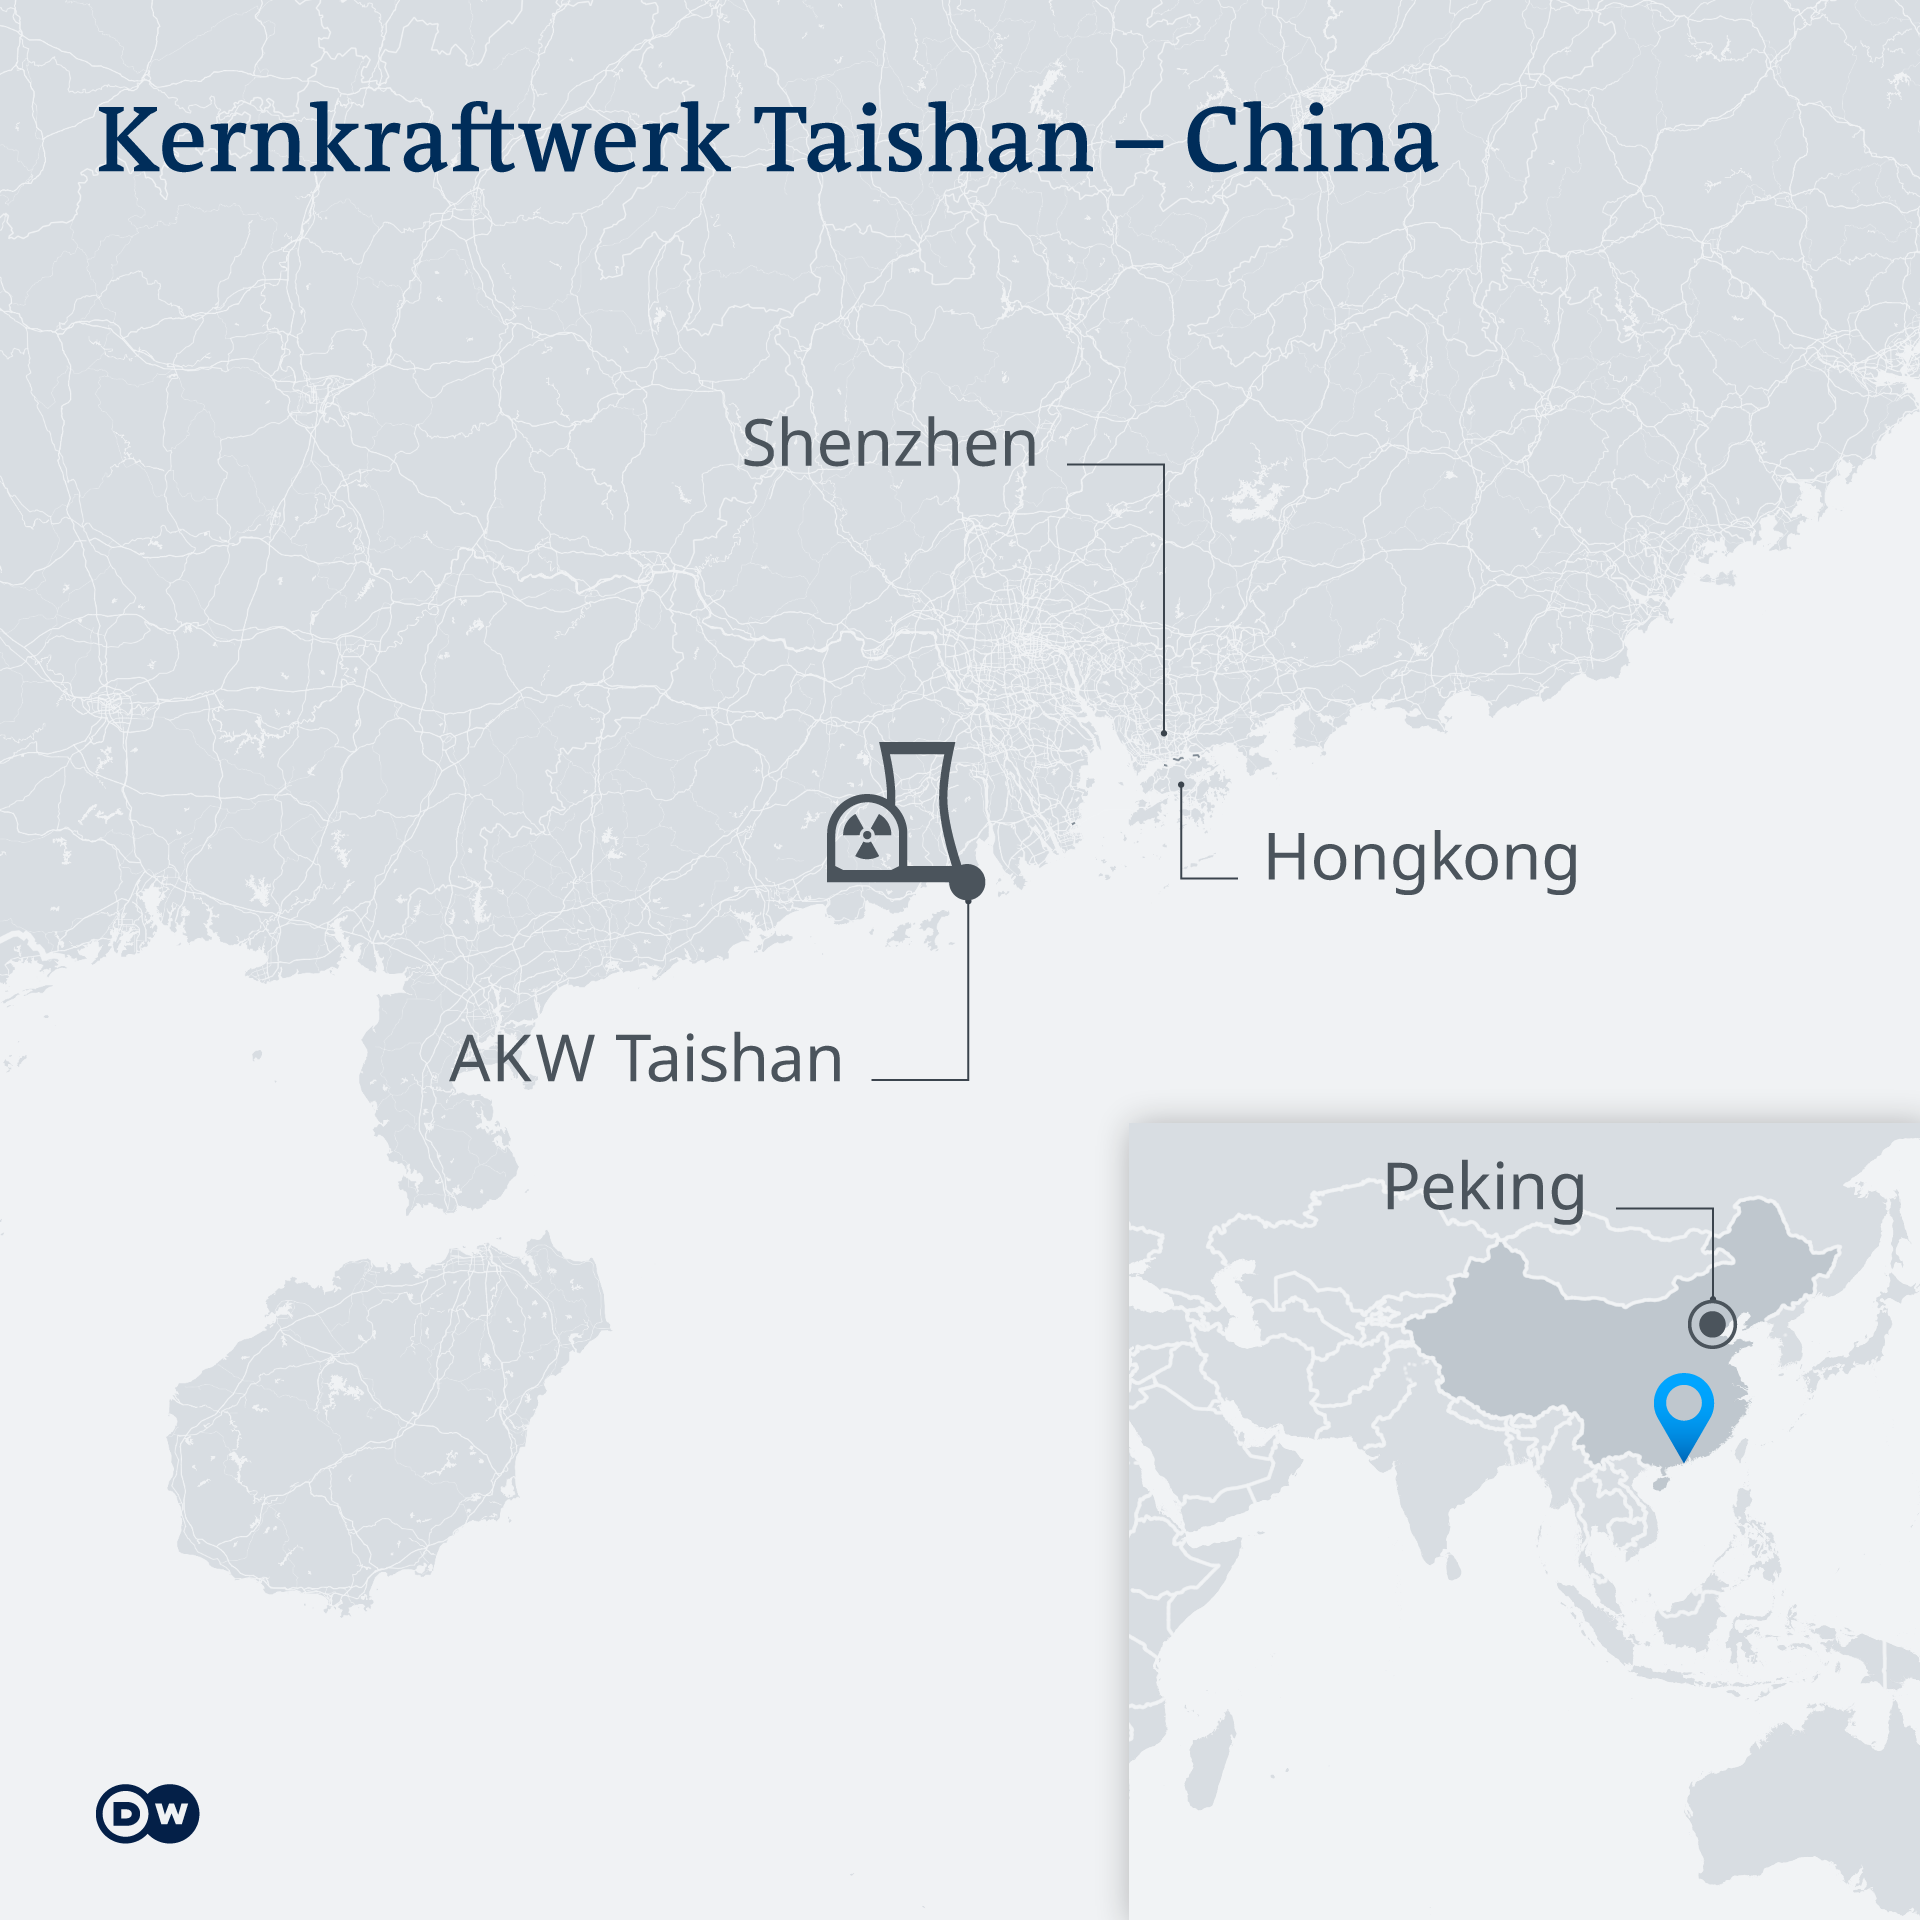 Karte: Standort des Kernkraftwerks in Taishan, China